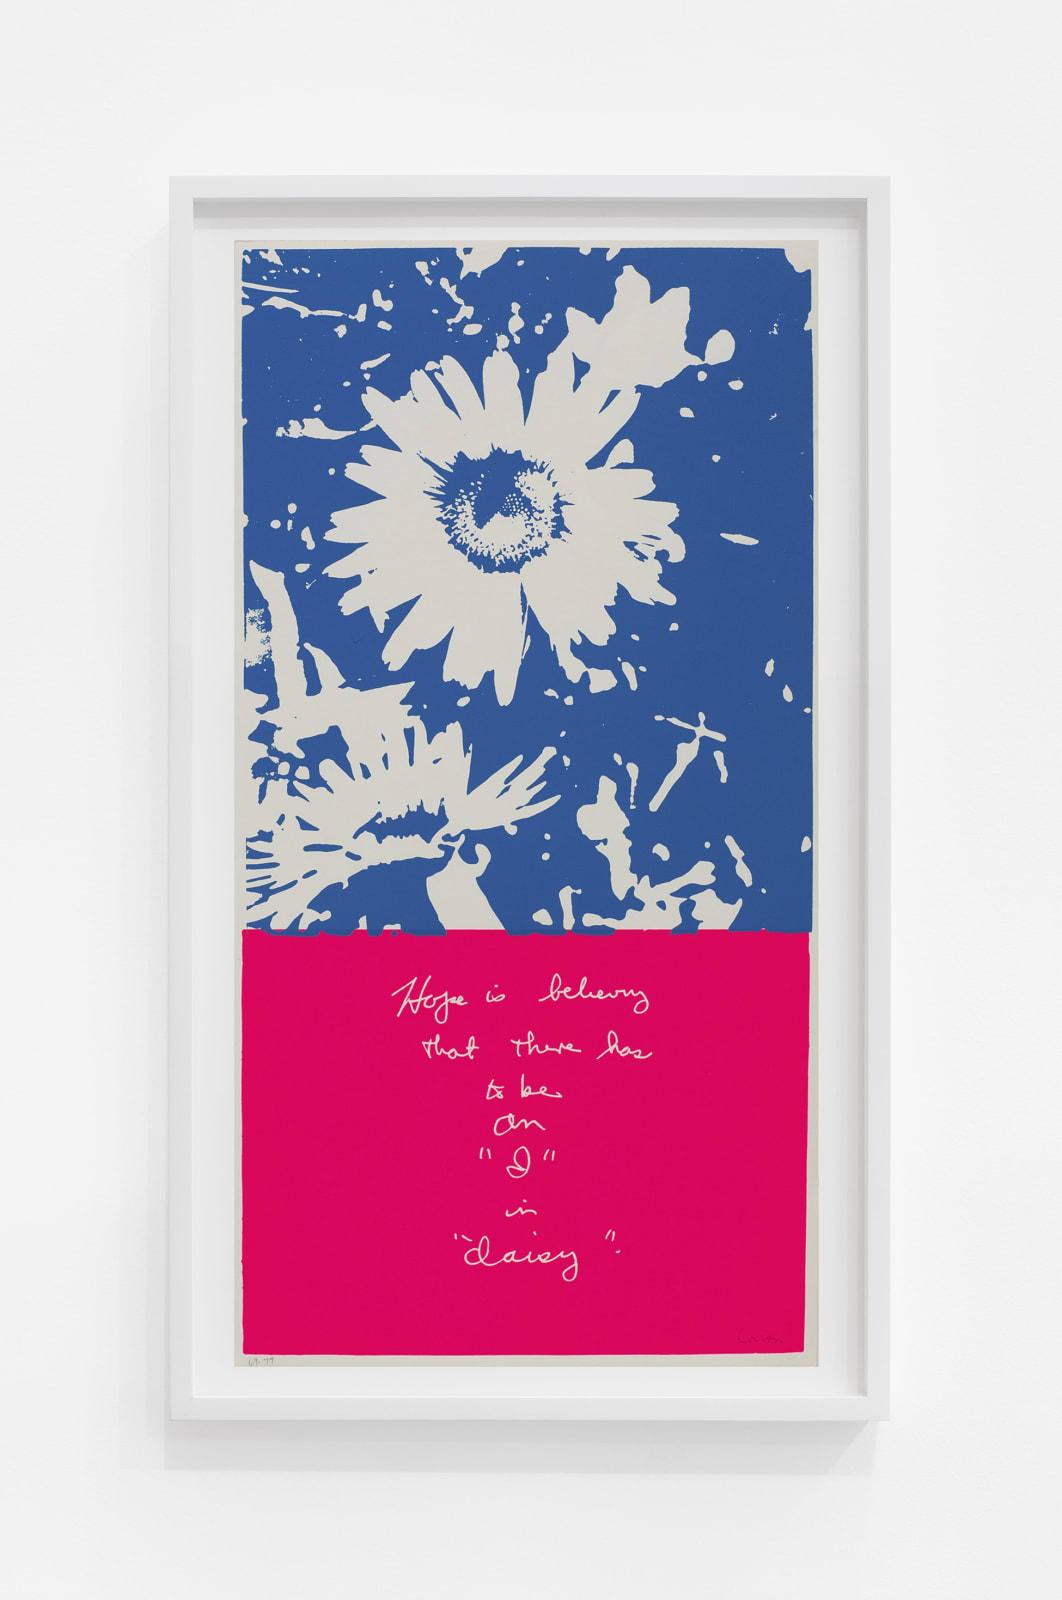 Corita Kent i in daisy , 1969 Screenprint 23 x 12 in (58.4 x 30.5 cm) $4,800.00